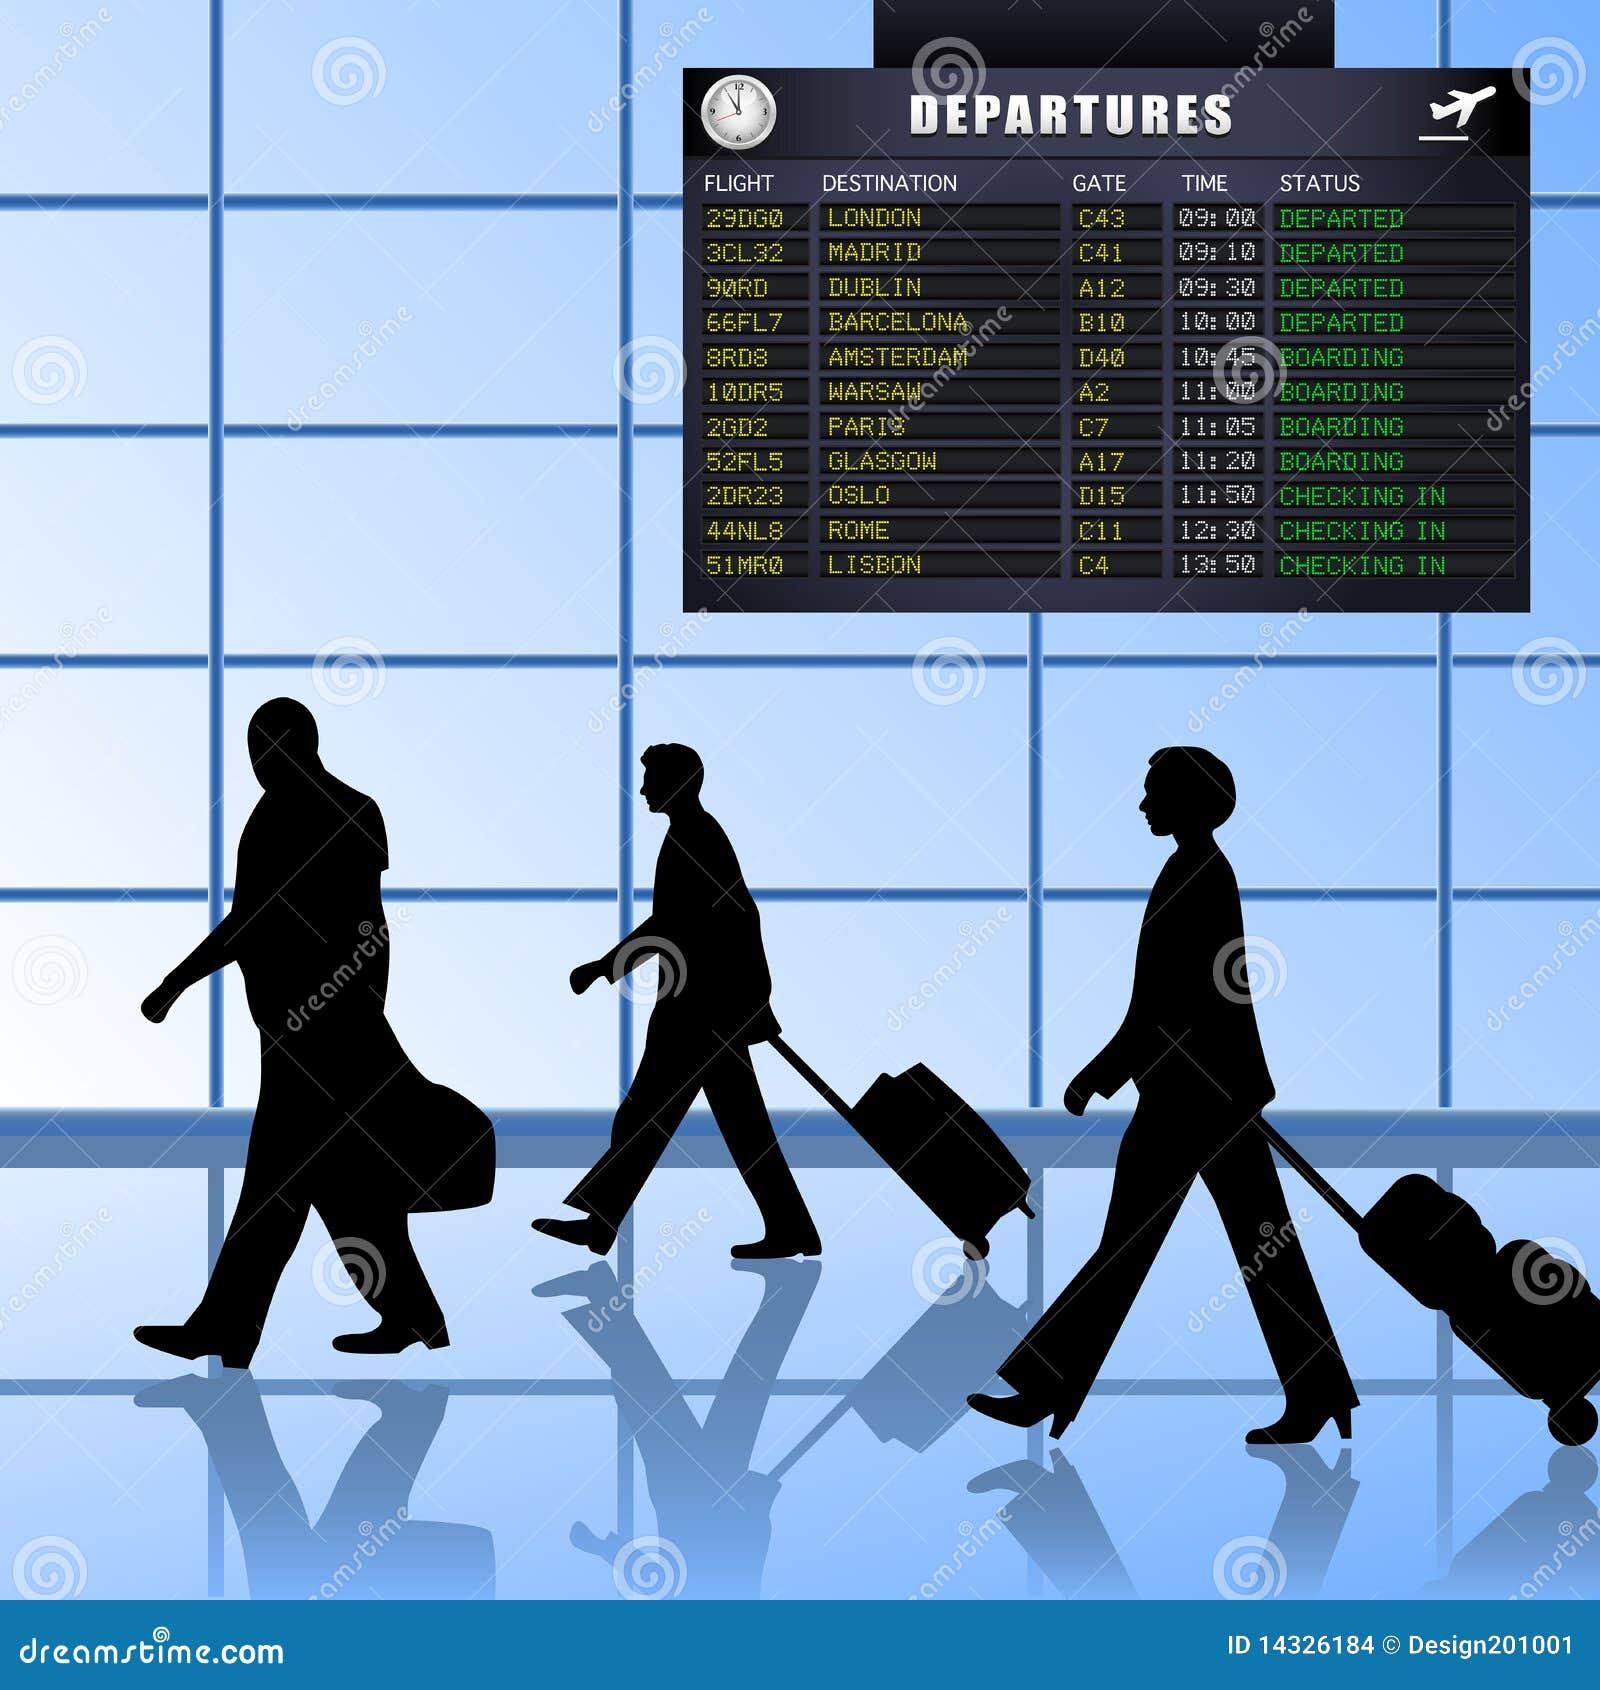 Airport - Set 1 - Passengers Departing Stock Images - Image: 14326184